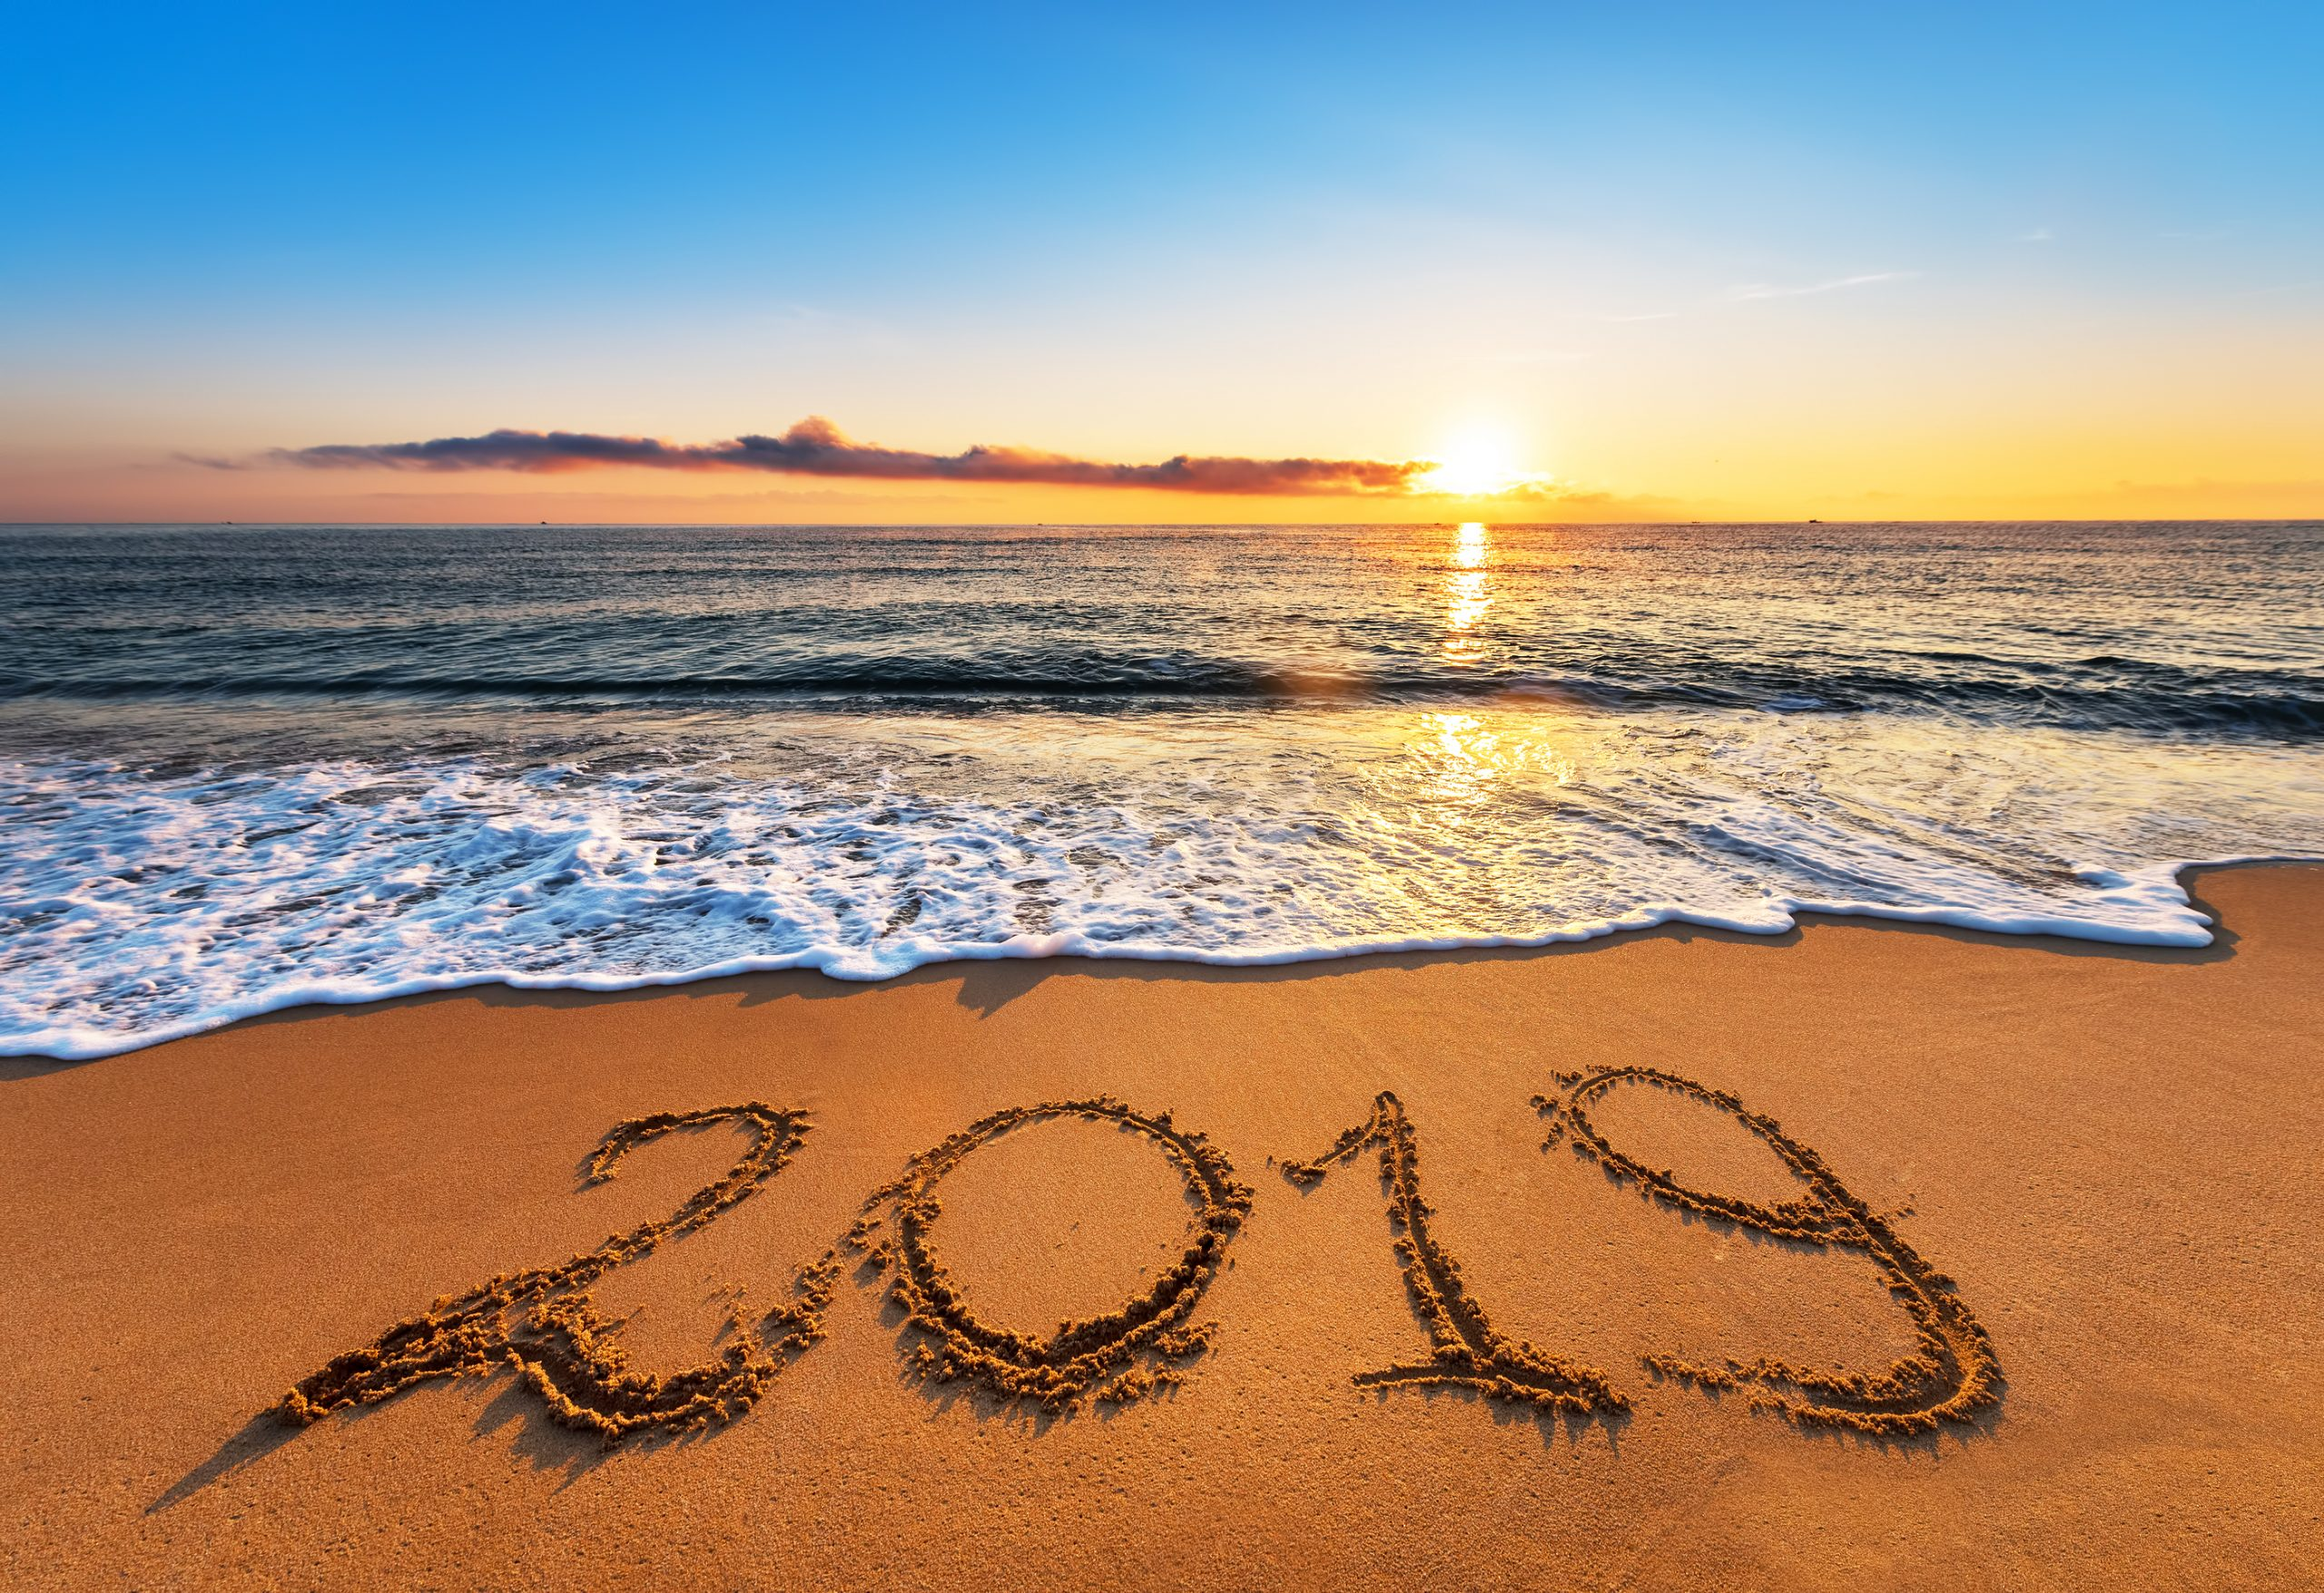 Number 2019 Written On Seashore Sand At Sunrise.Happy New Year